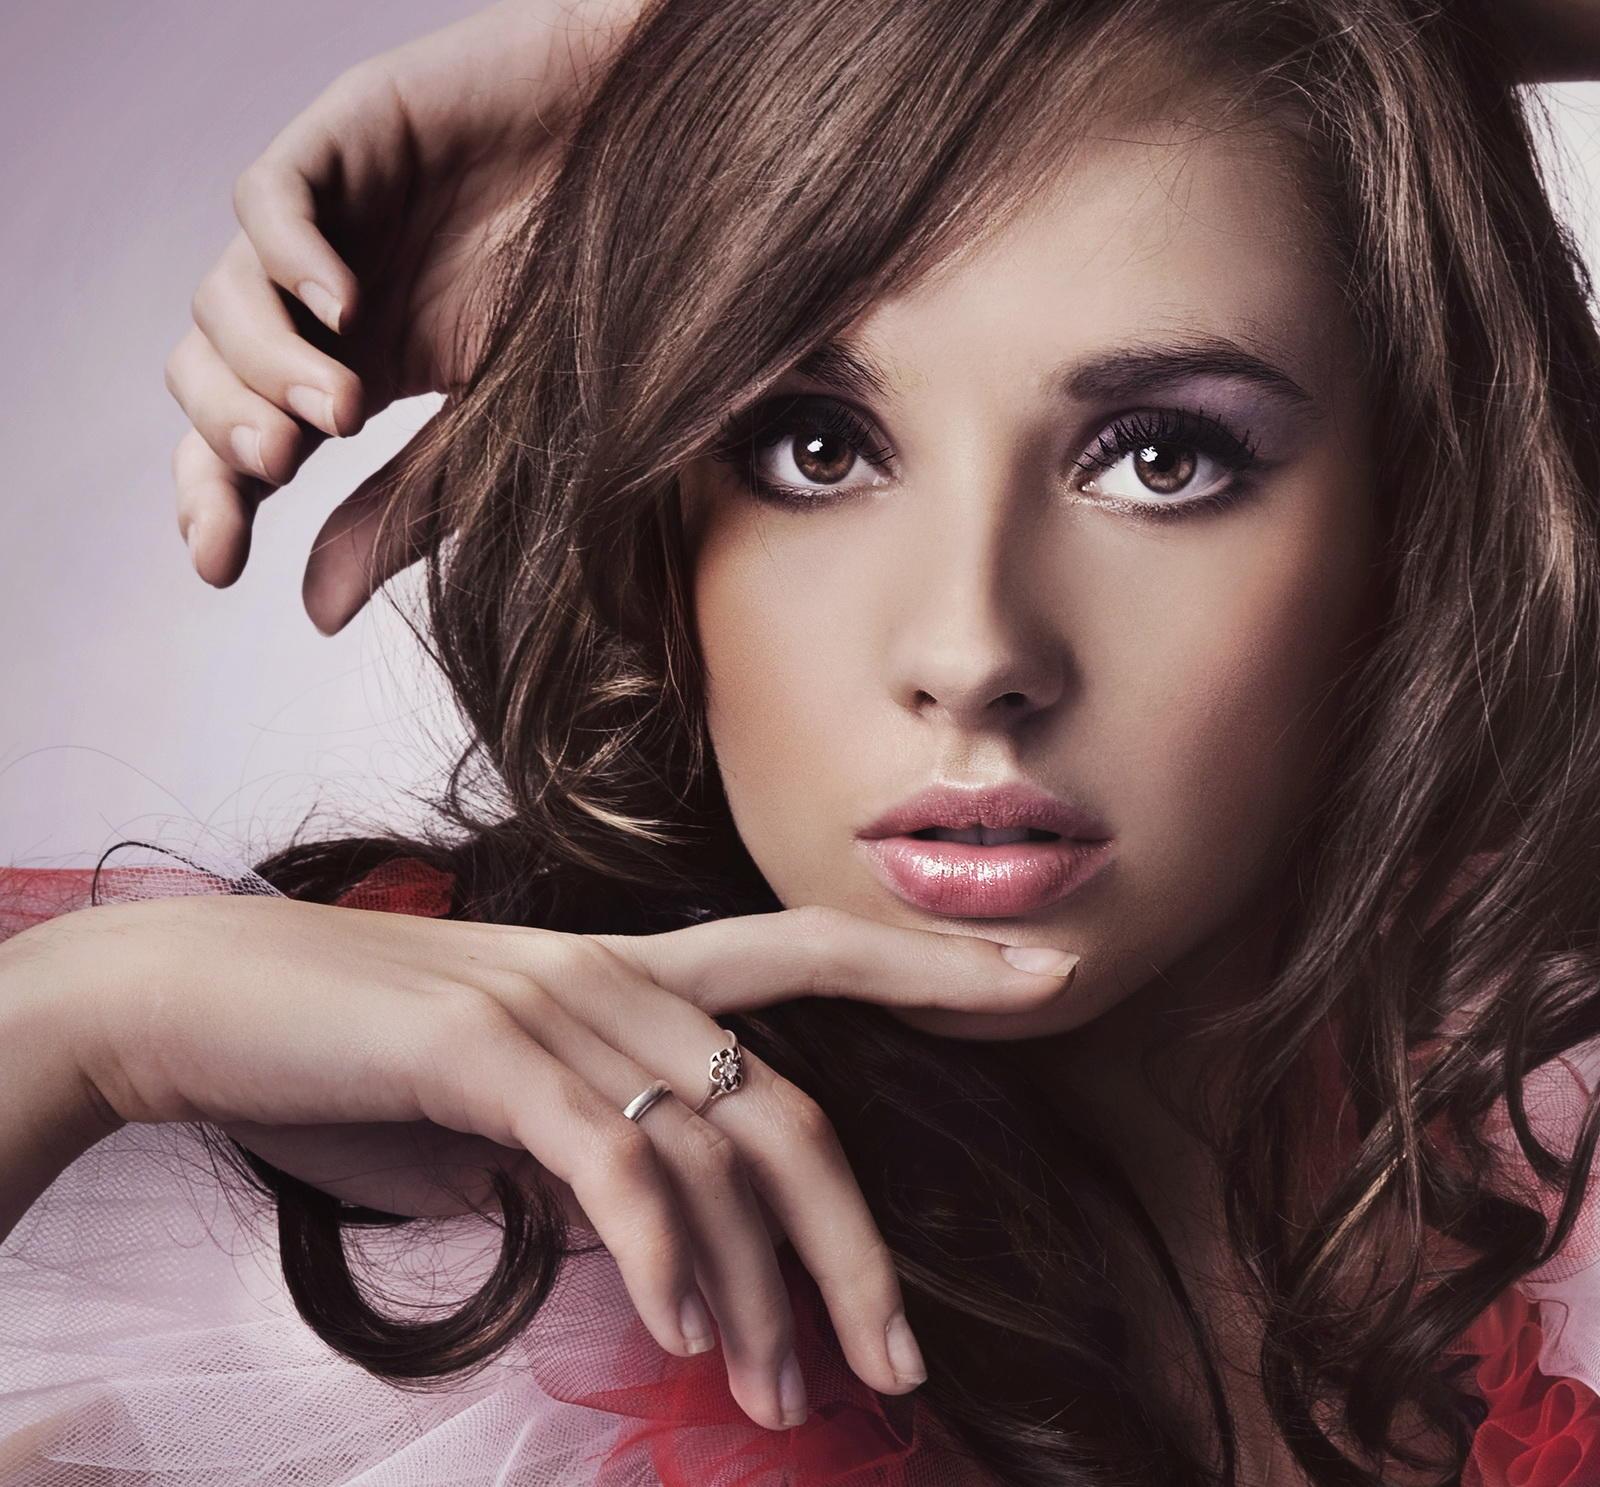 обои девушка, модель, Анна Субботина, макияж картинки фото